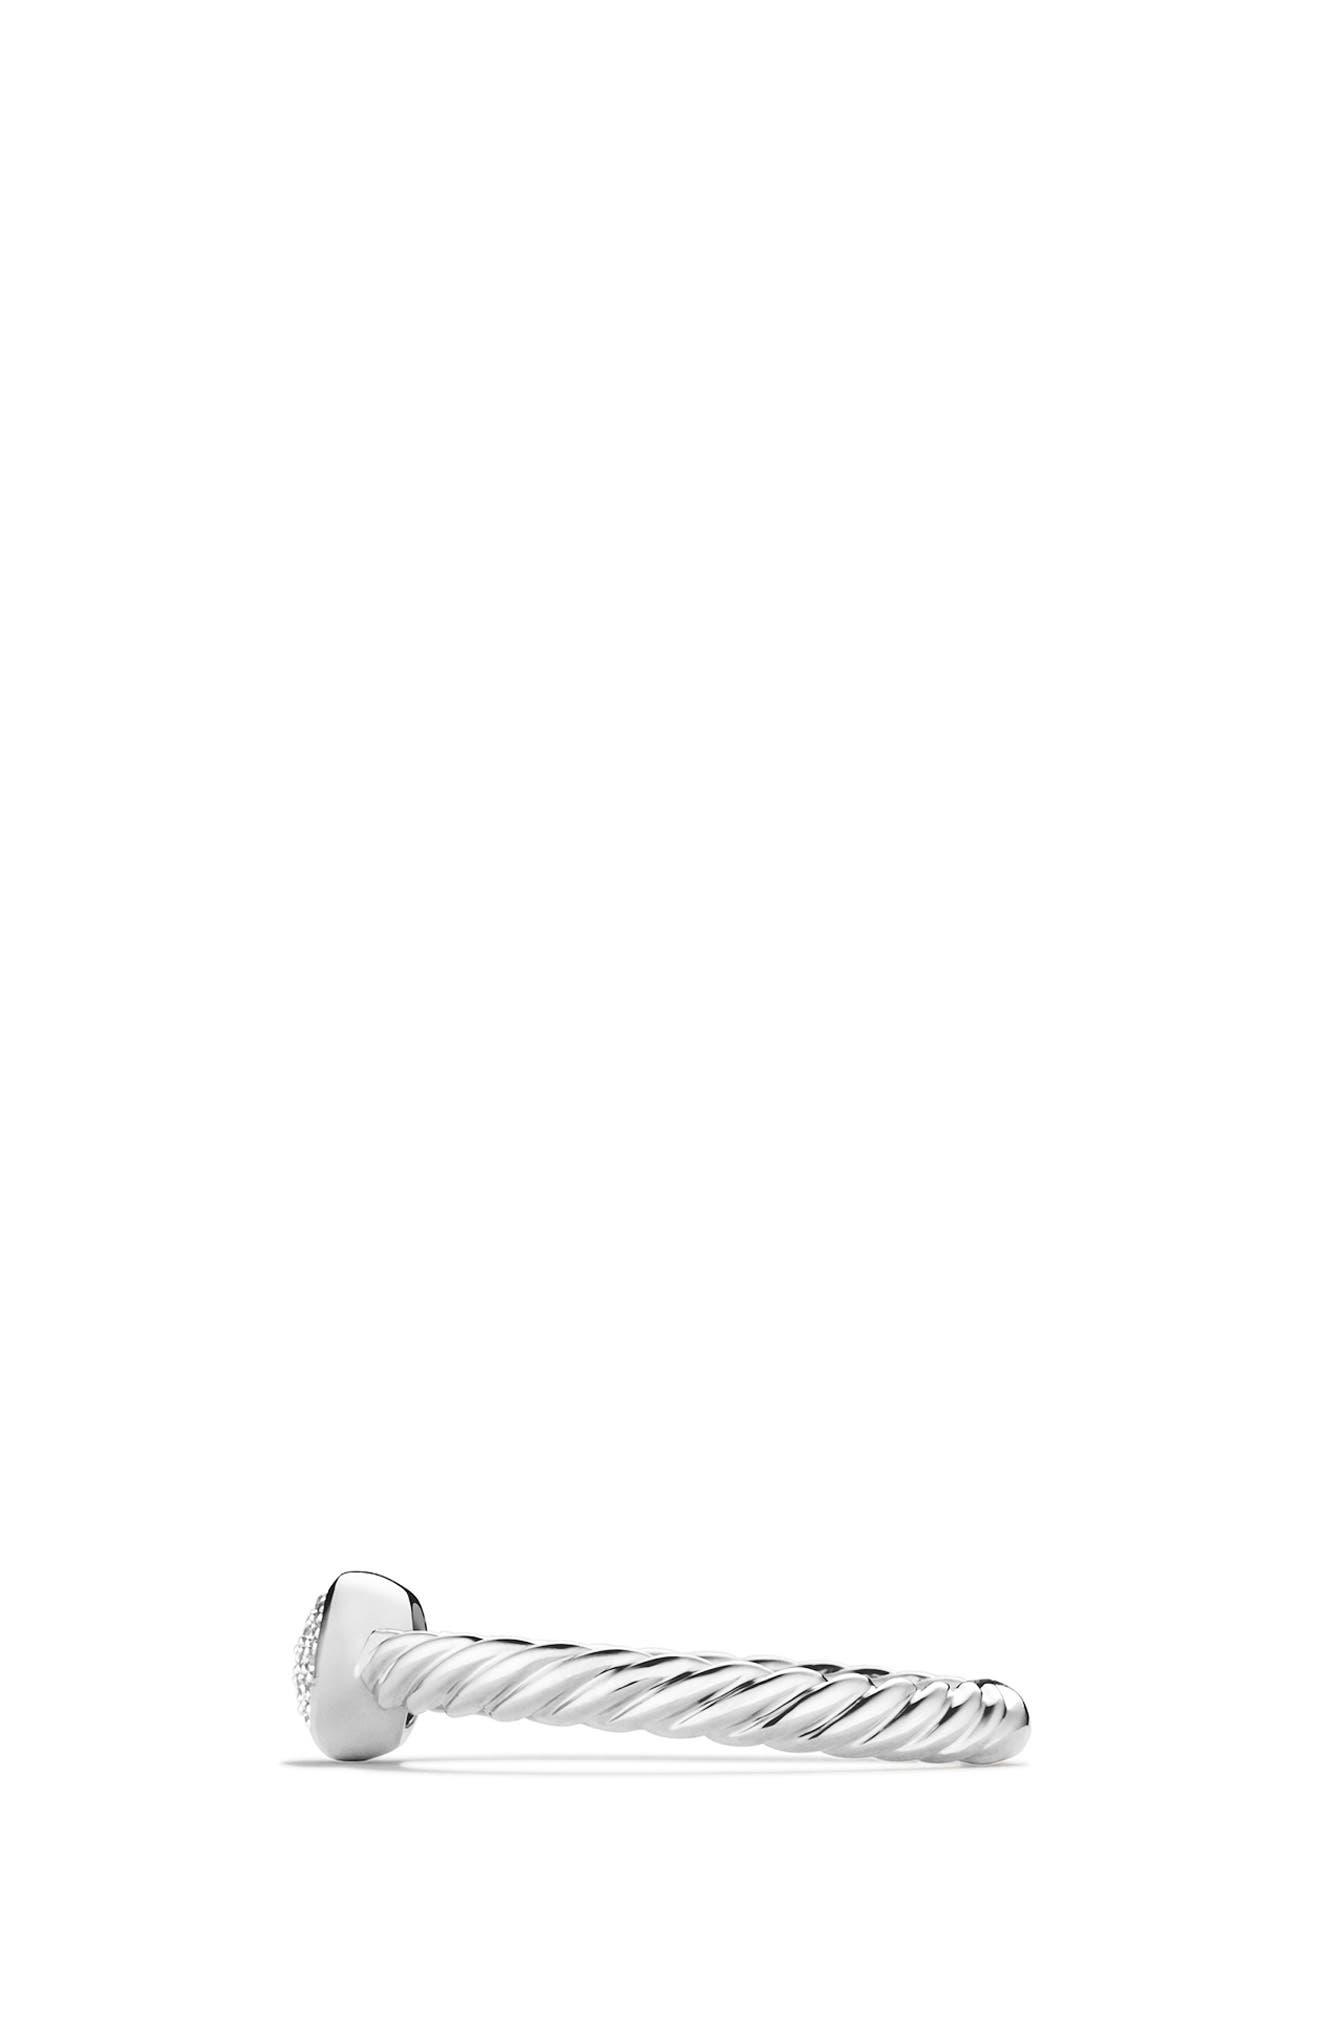 Petite Pavé Oval Ring with Diamonds,                             Alternate thumbnail 2, color,                             100